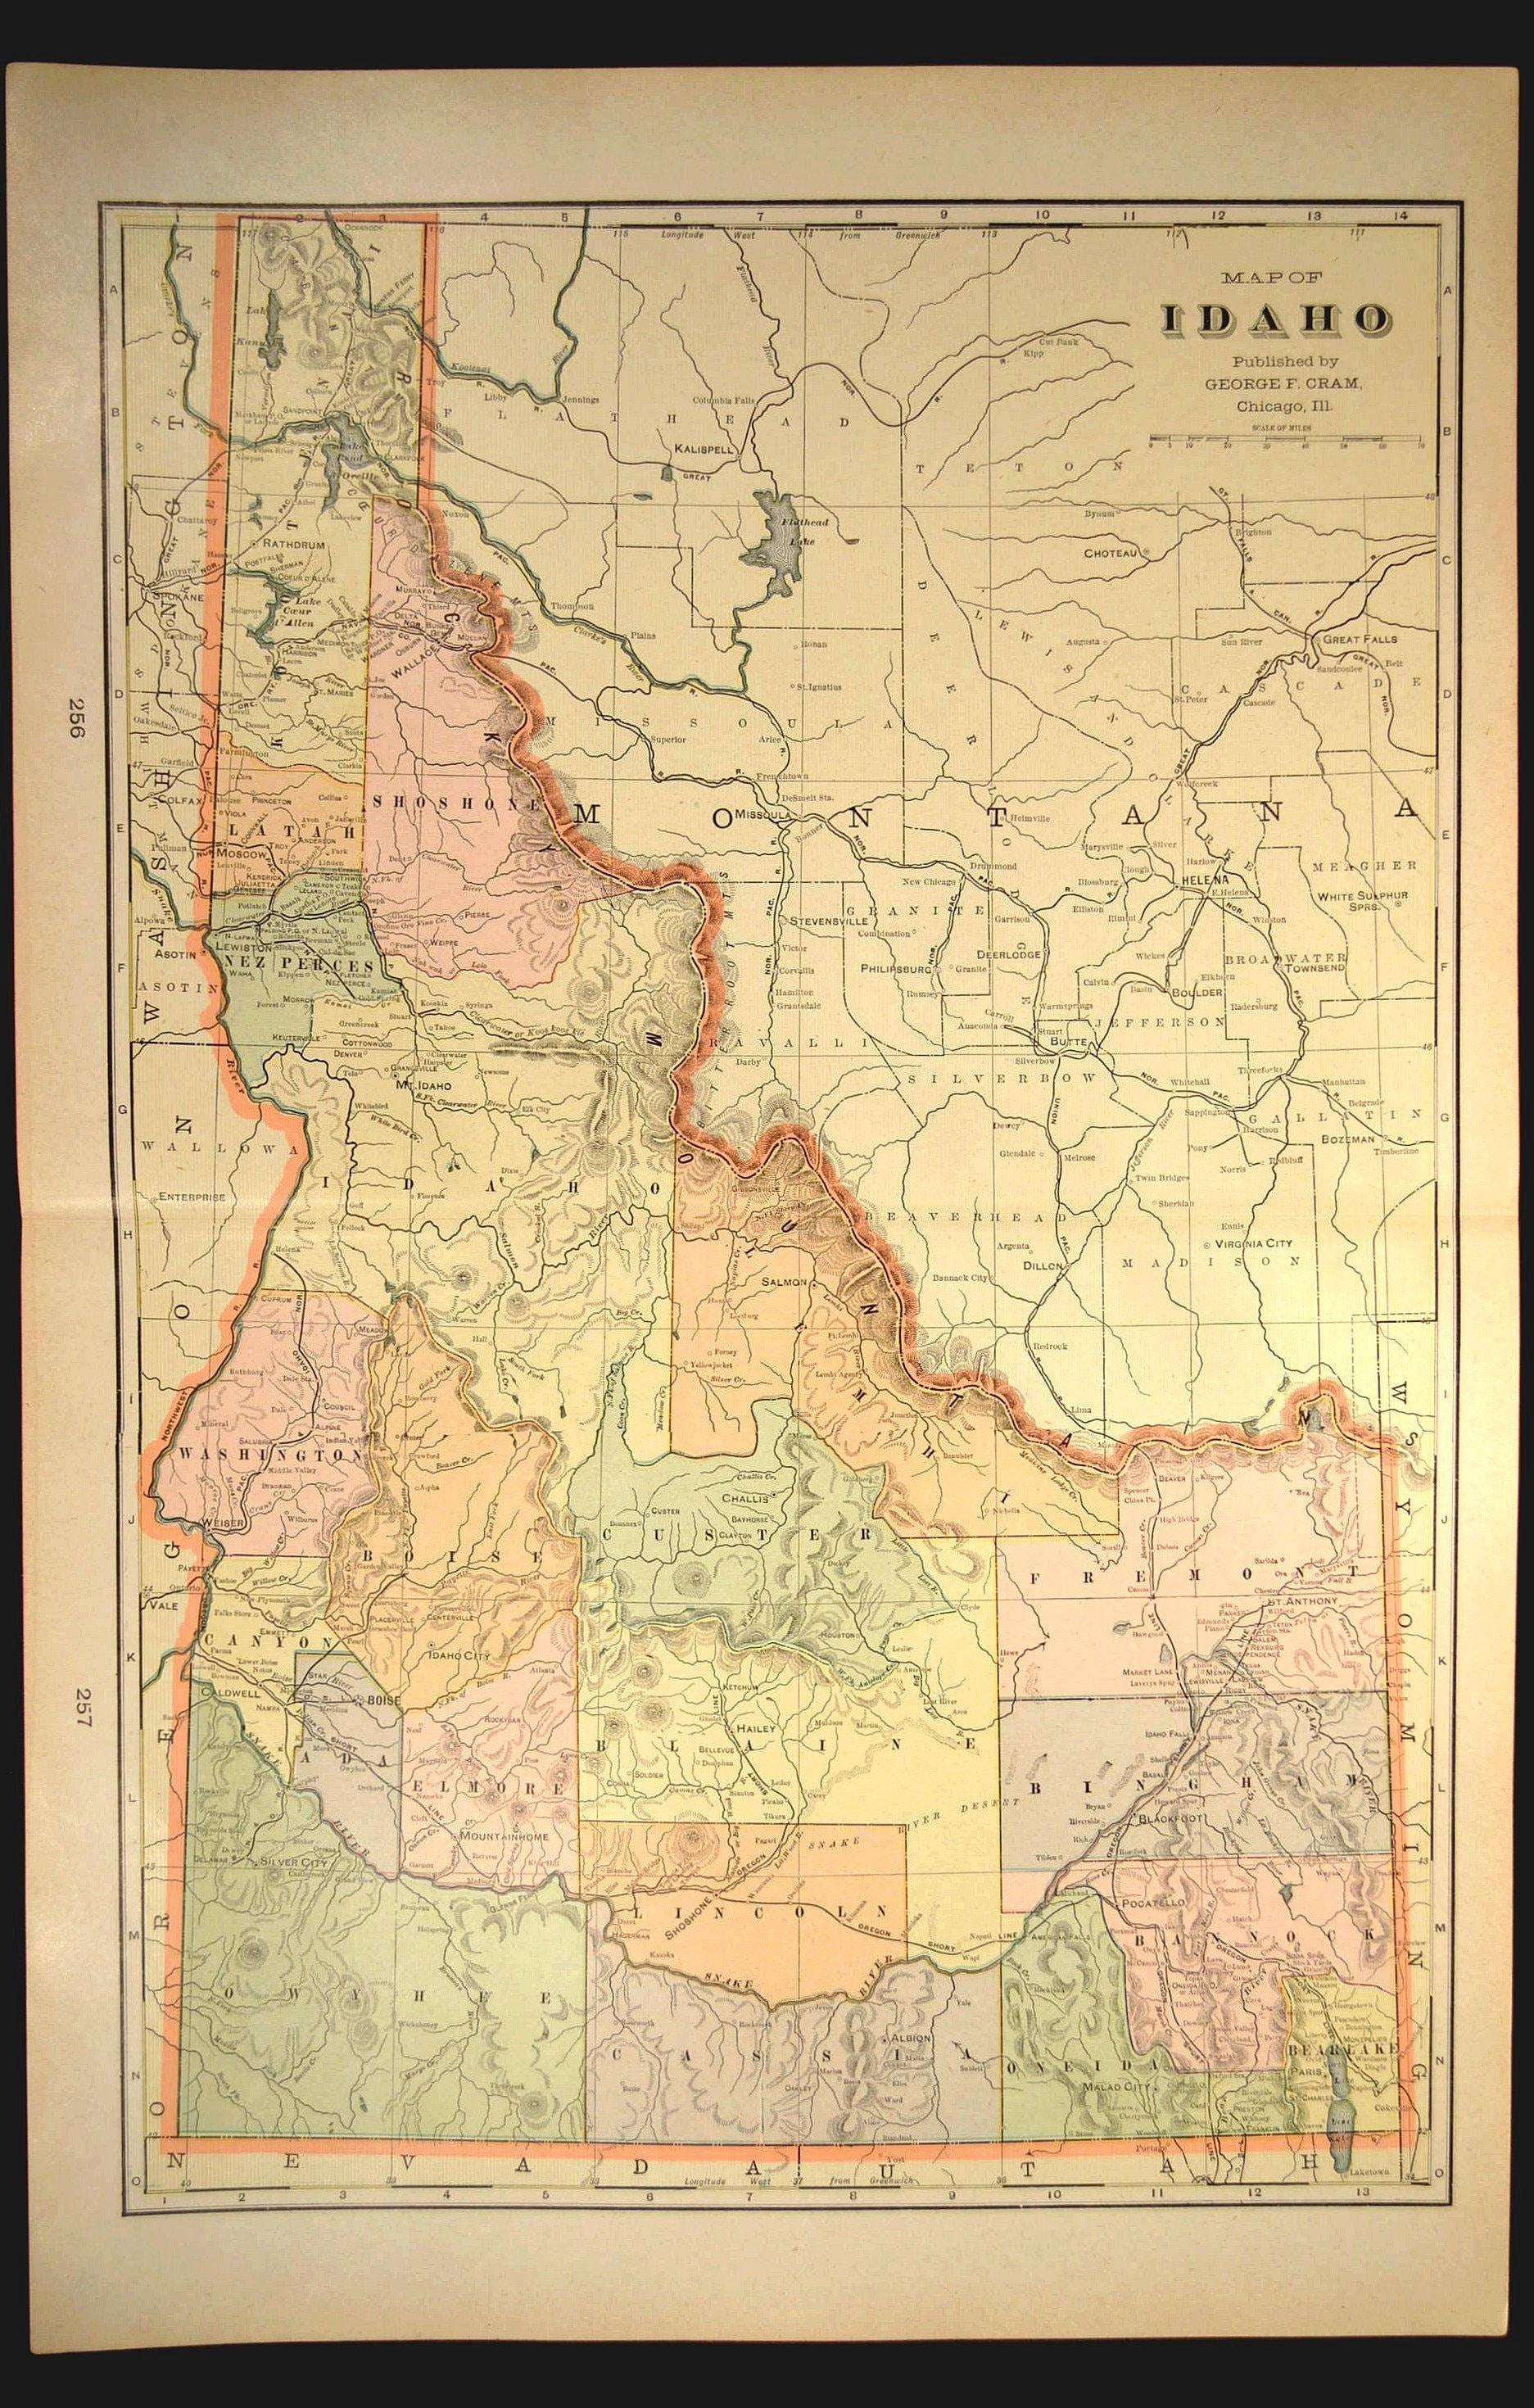 Albion Idaho Map.Idaho Map Of Idaho Wall Decor Art Large Antique Original Gift Etsy